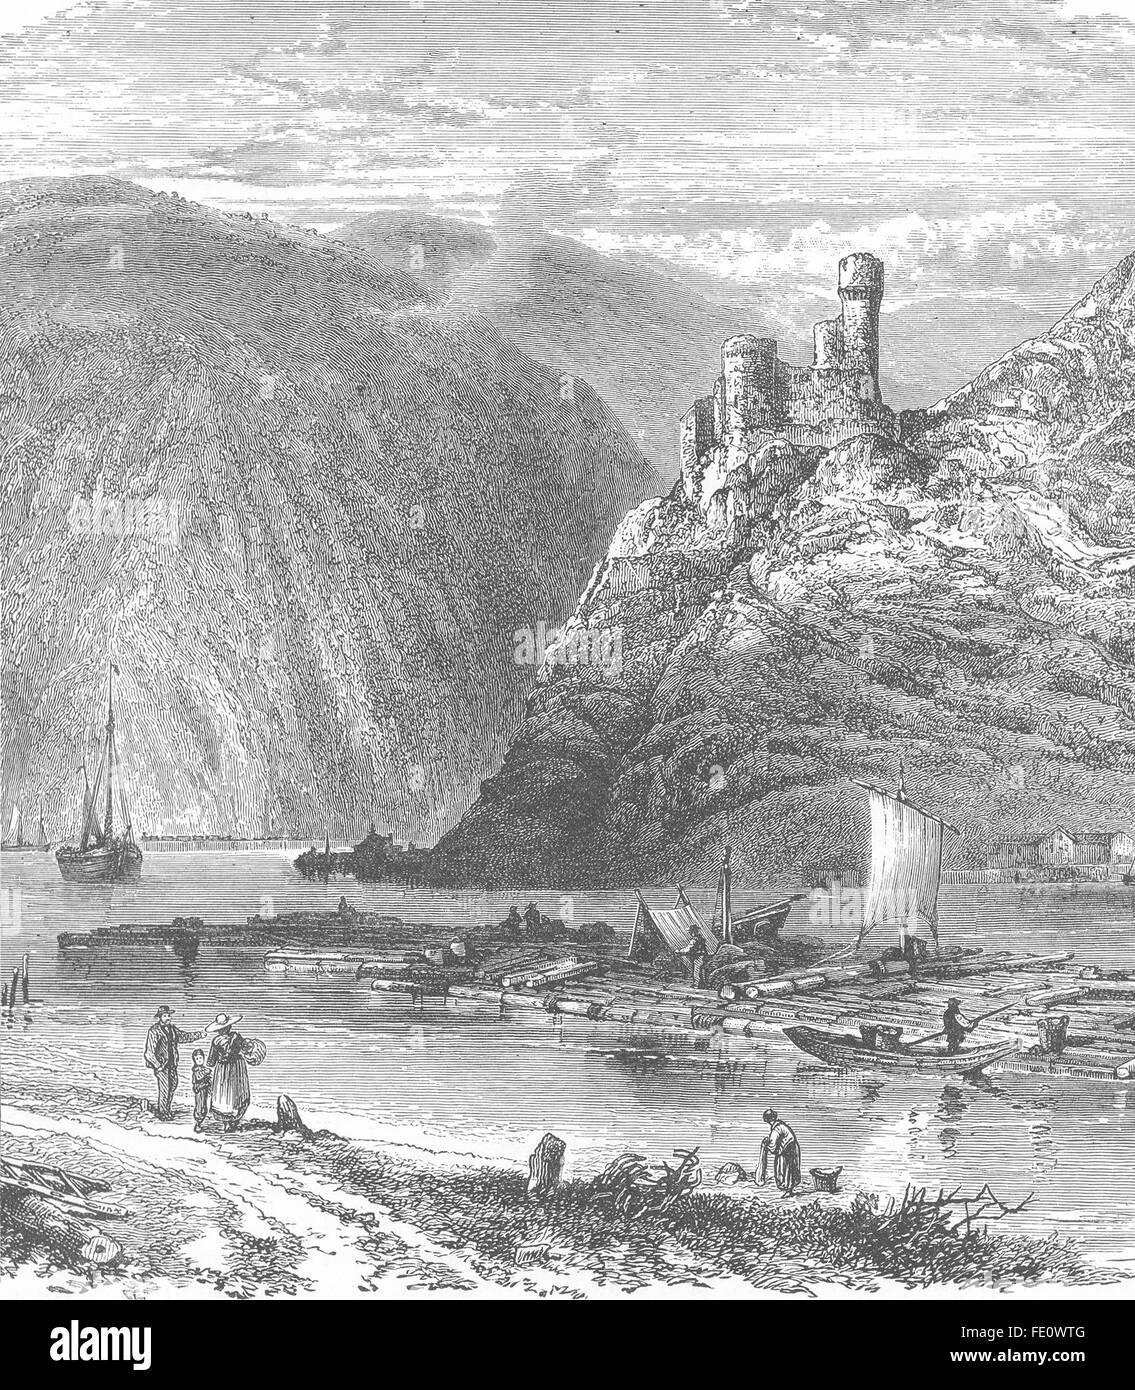 GERMANY: The Rhine below Bingen, at the Taunus Mountains. Ehrenfels castle, 1893 - Stock Image